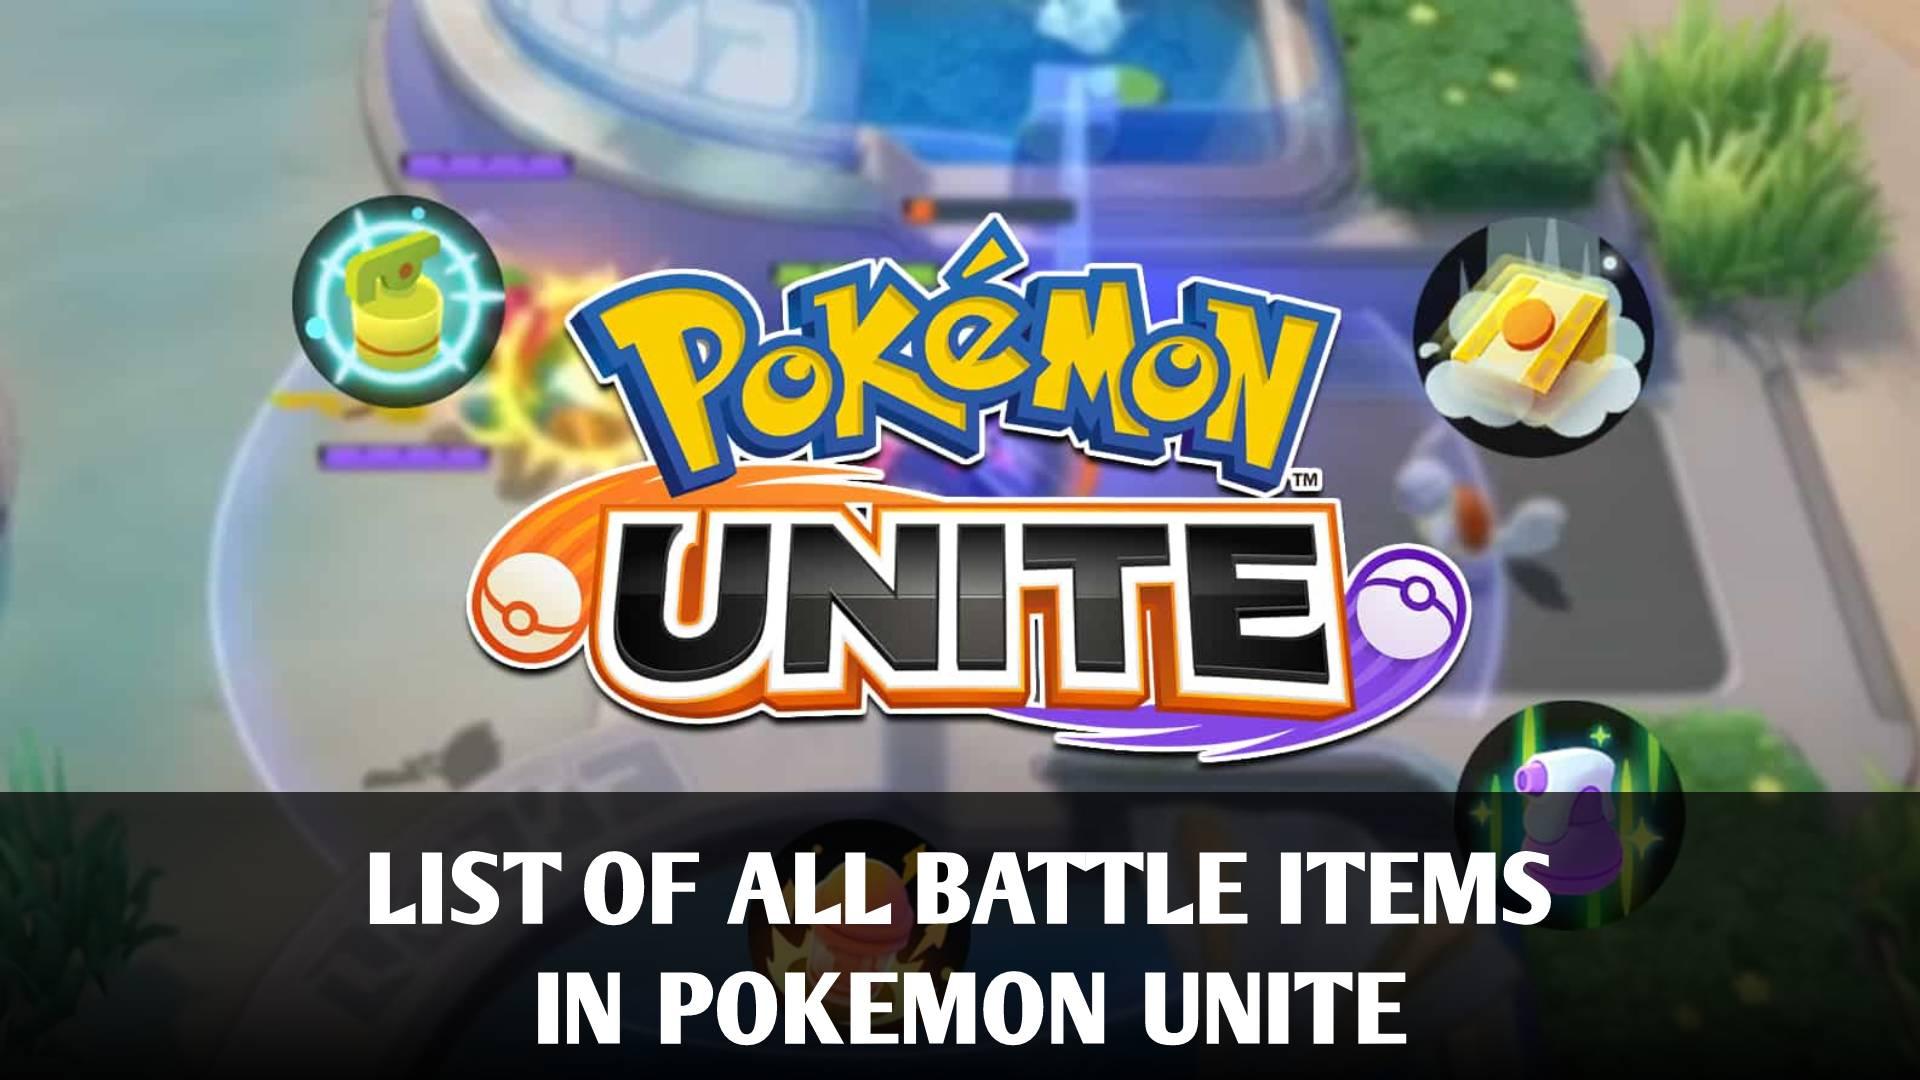 List of All Battle Items in Pokemon Unite